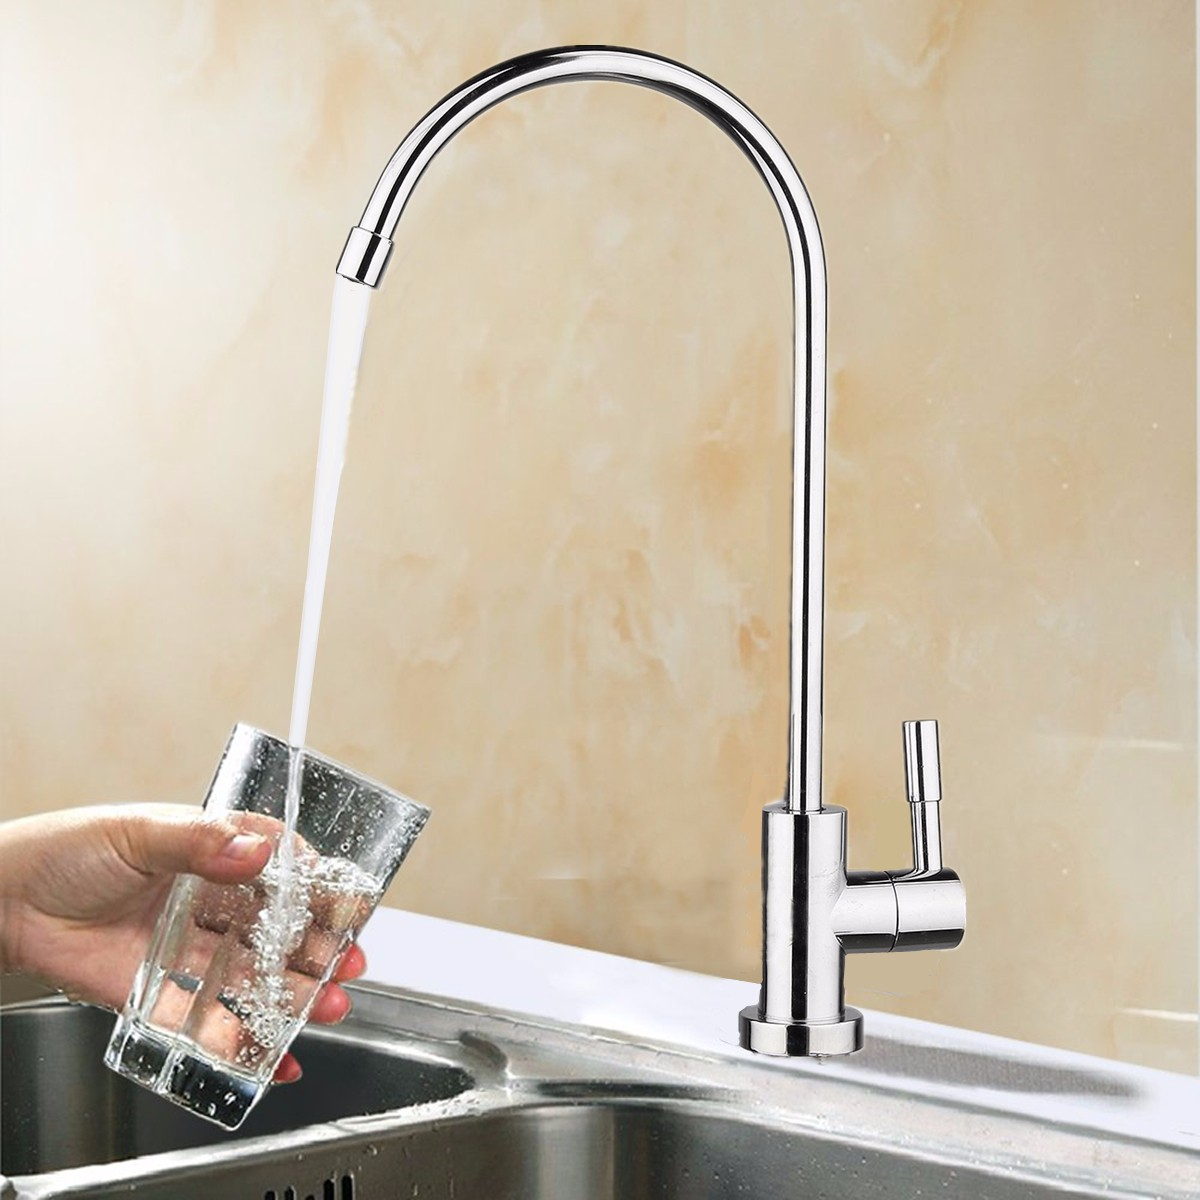 1/4 Reverse Bathroom Kitchen 360 Degree Drinking Water Filter Gooseneck Type Basin Faucets Kitchen Sink Tap Chrome